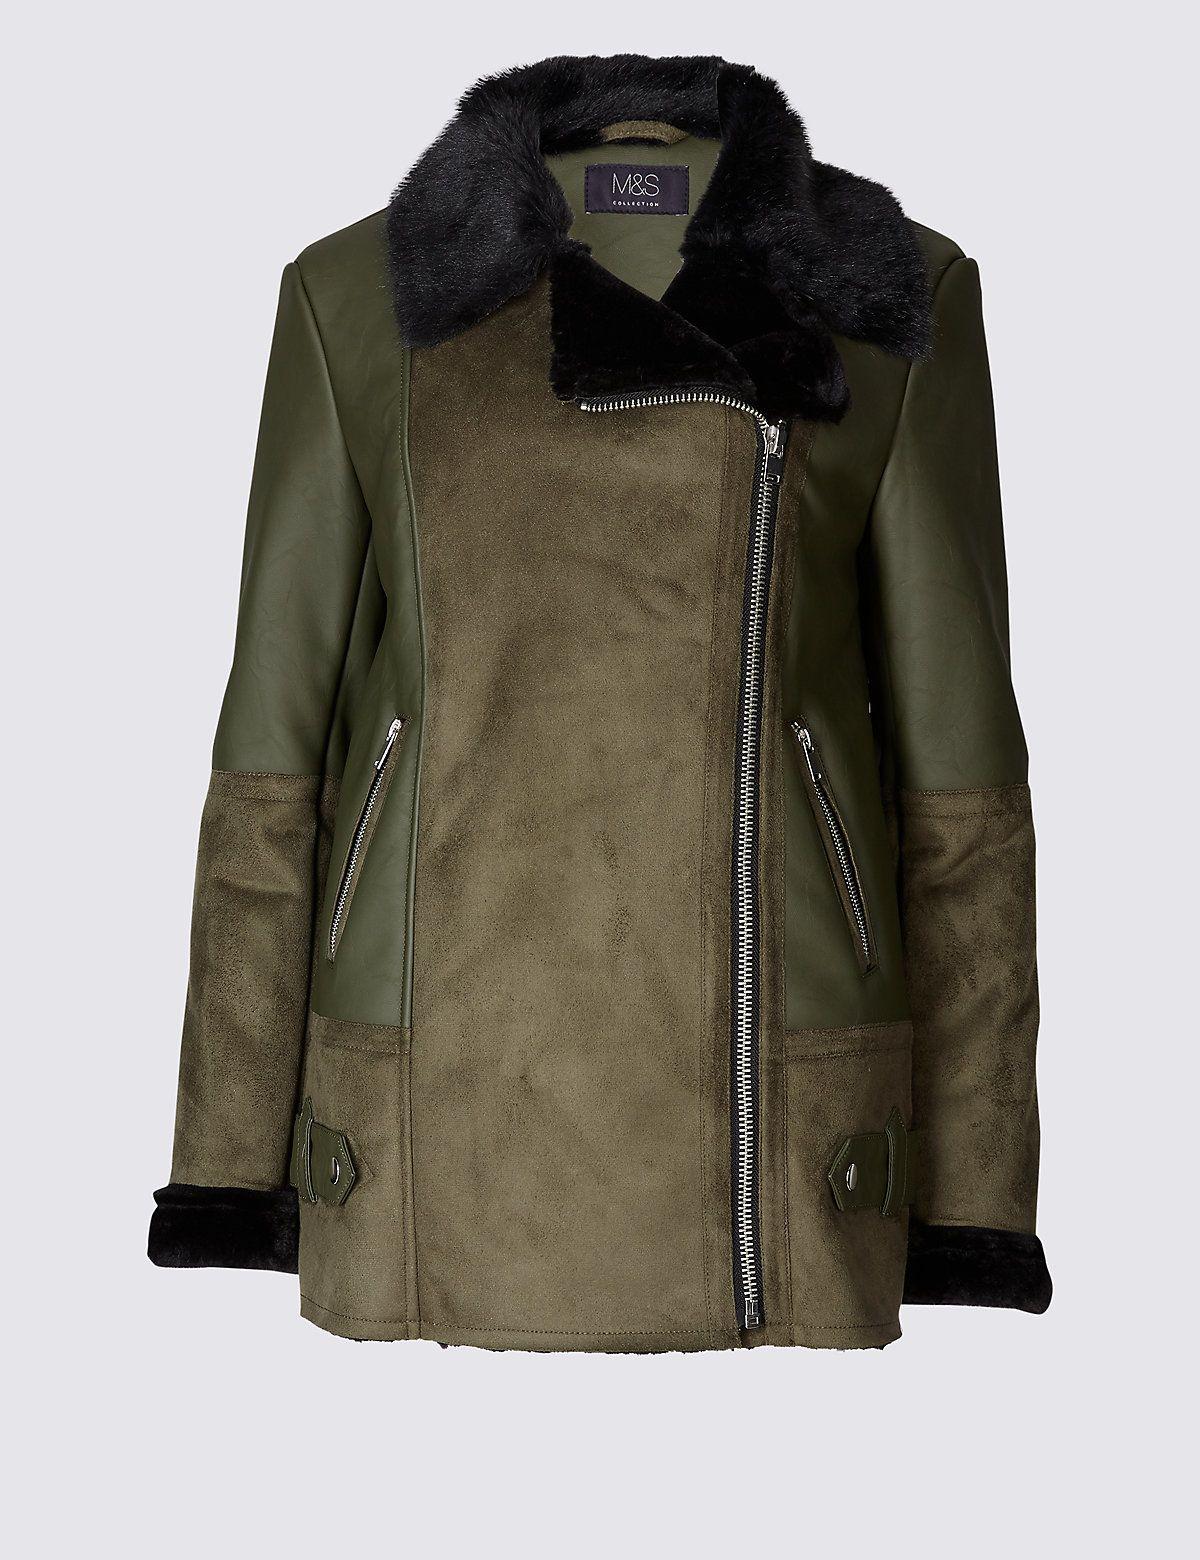 Faux Leather Shearling Jacket Shearling jacket, Jackets